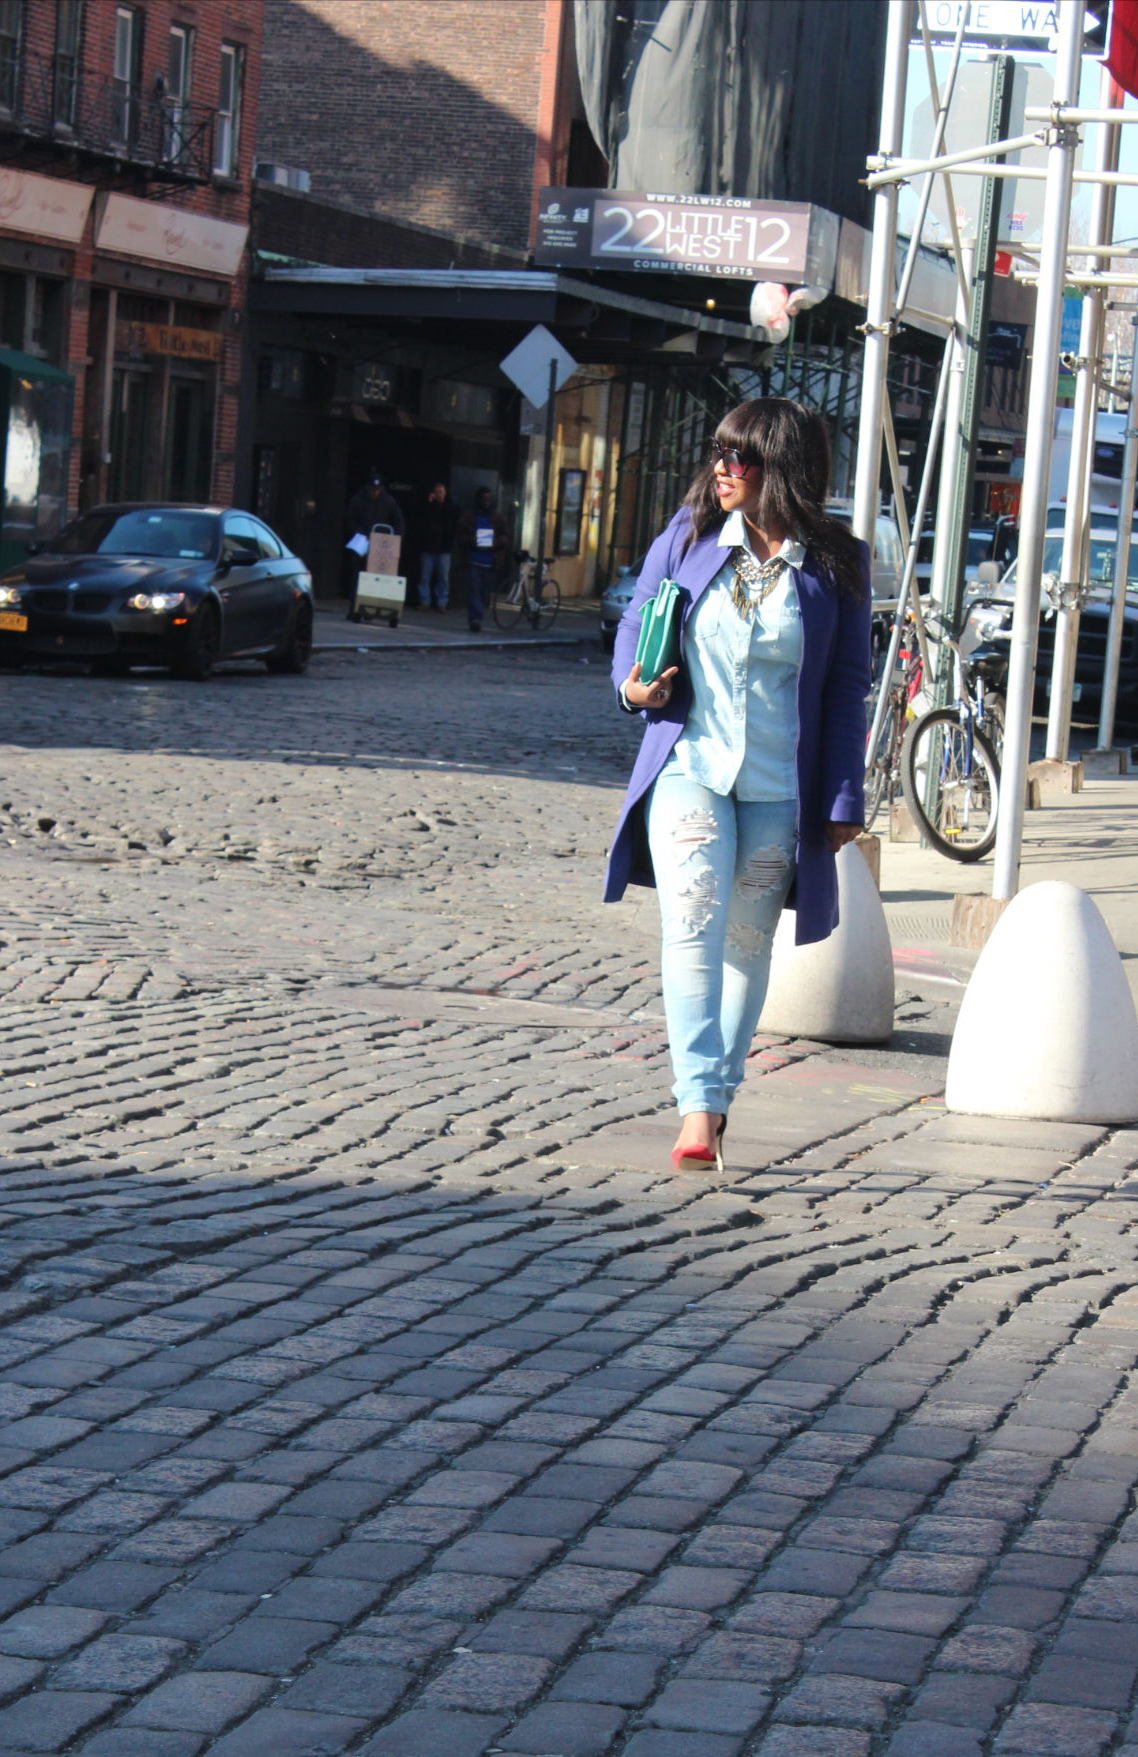 NYC_0013.jpg